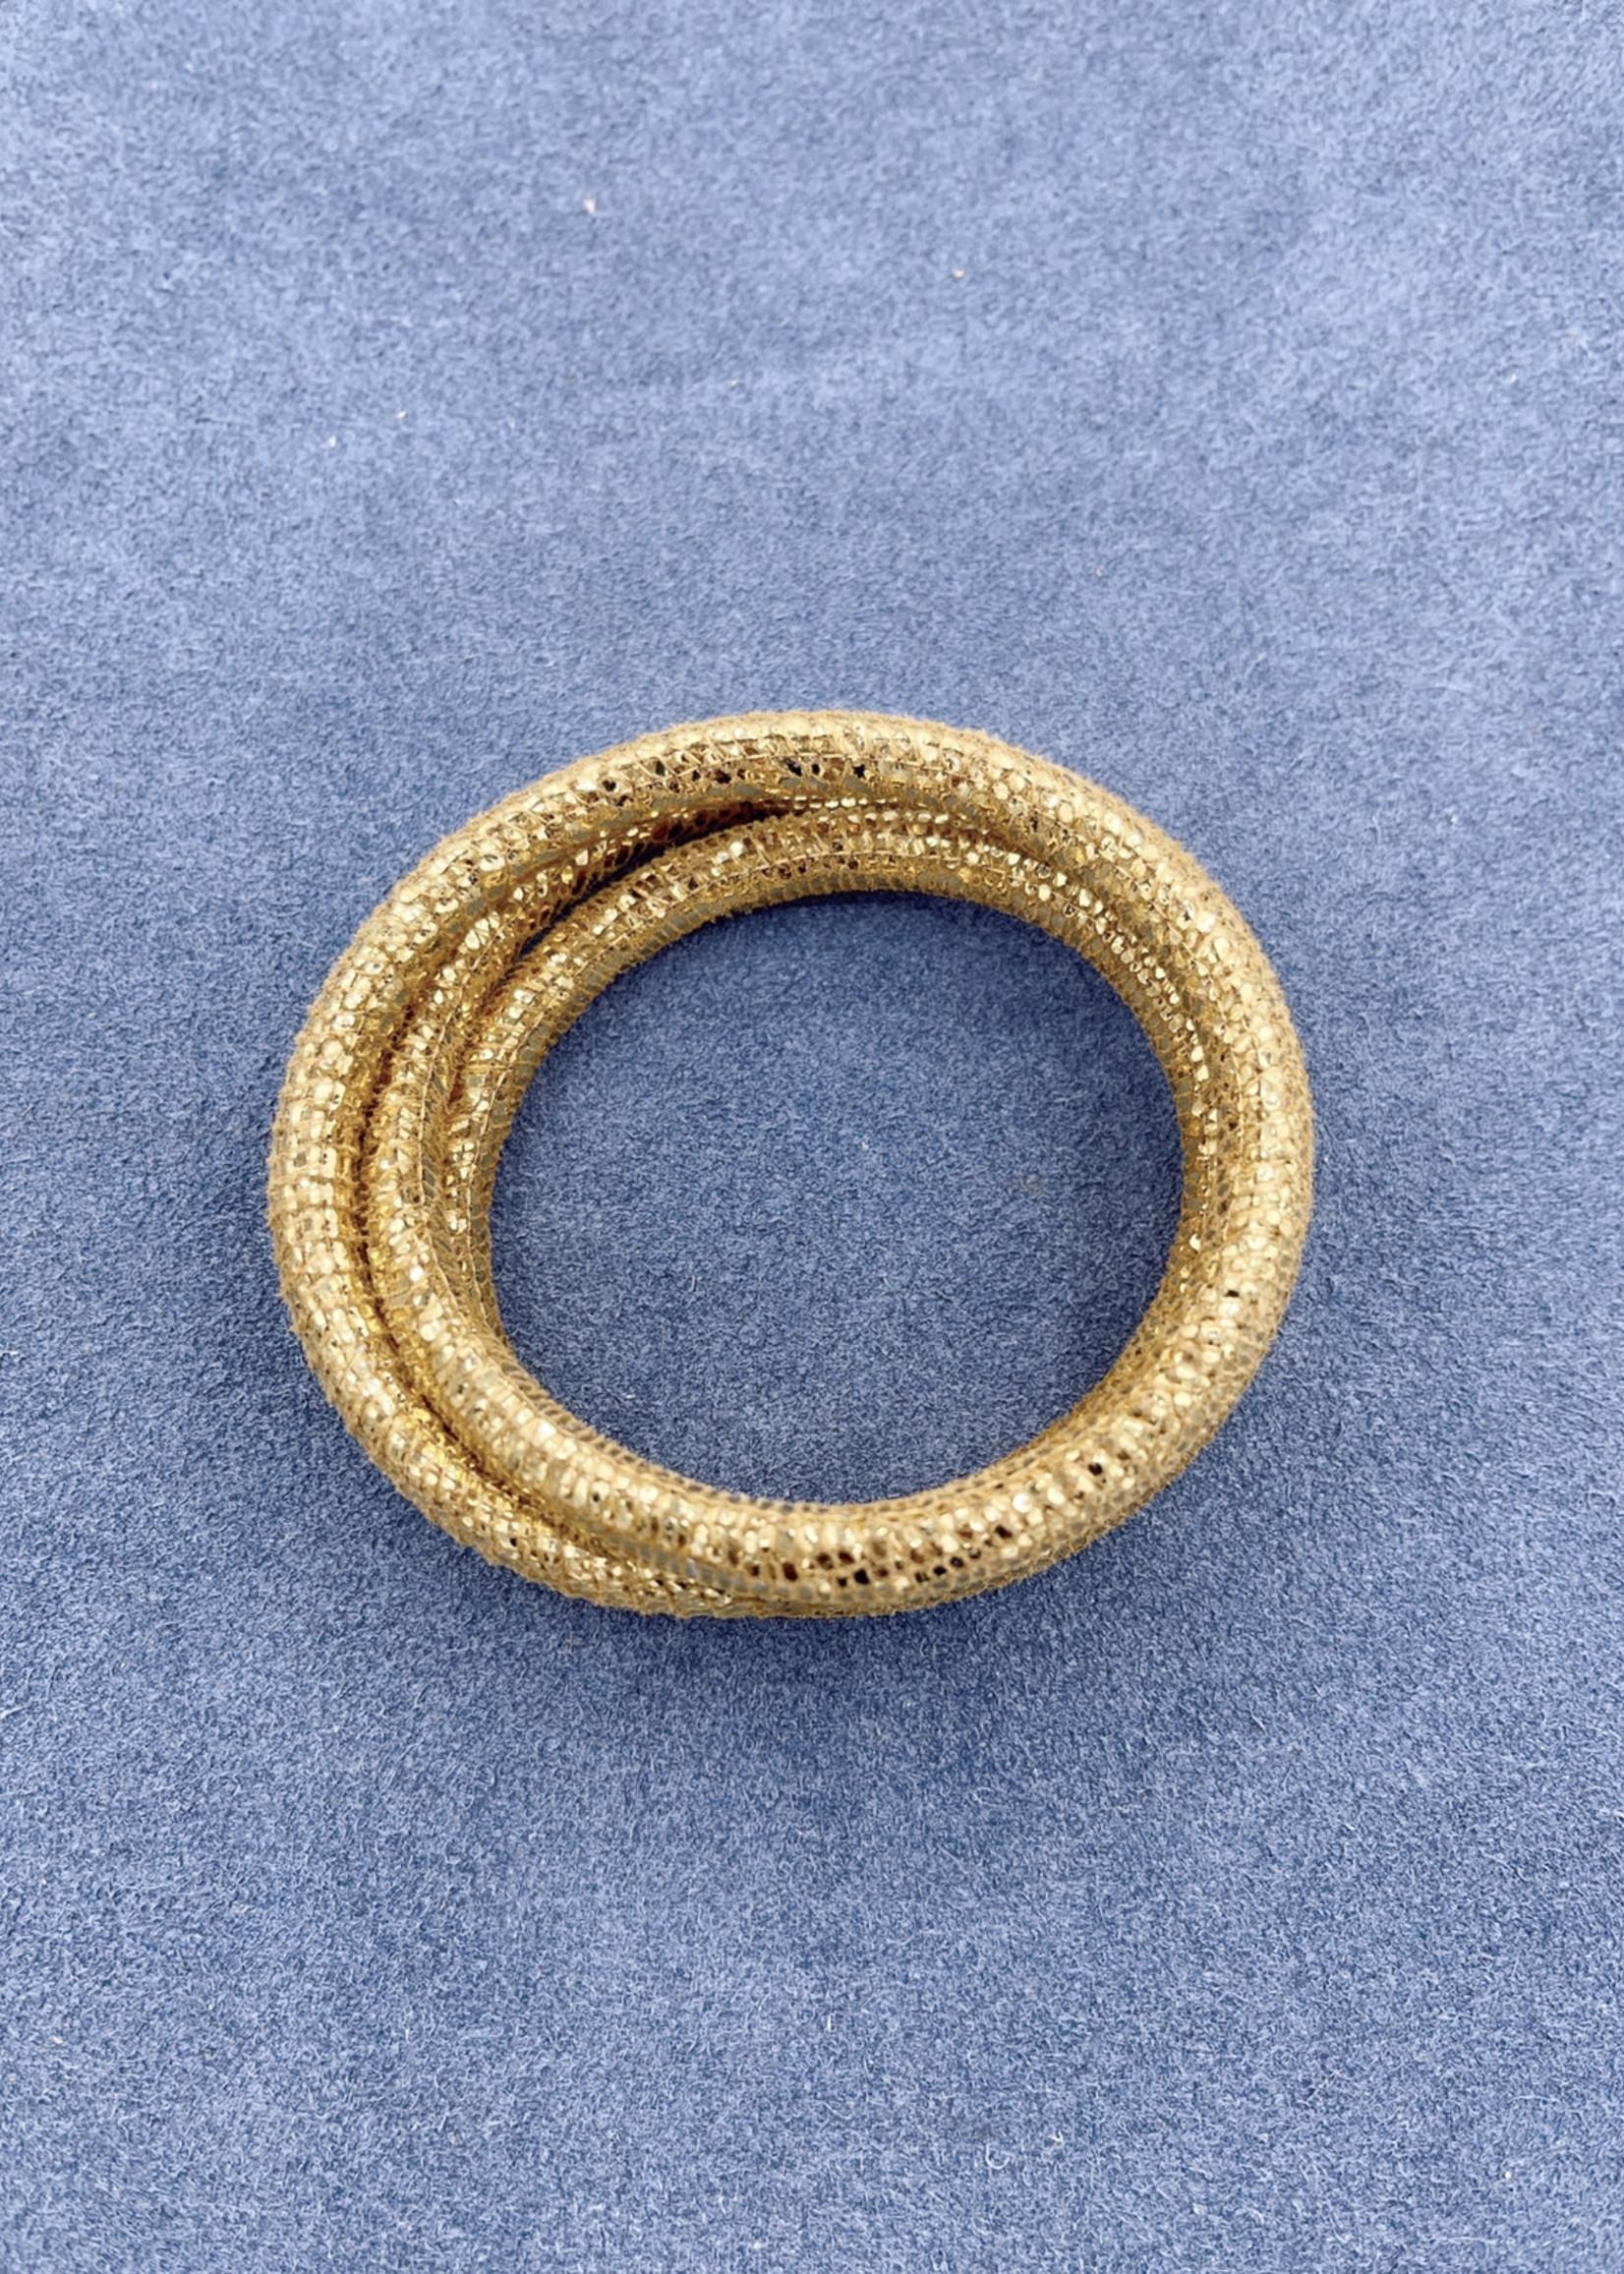 Stardom Gold Glitter Leather Charm Bracelet